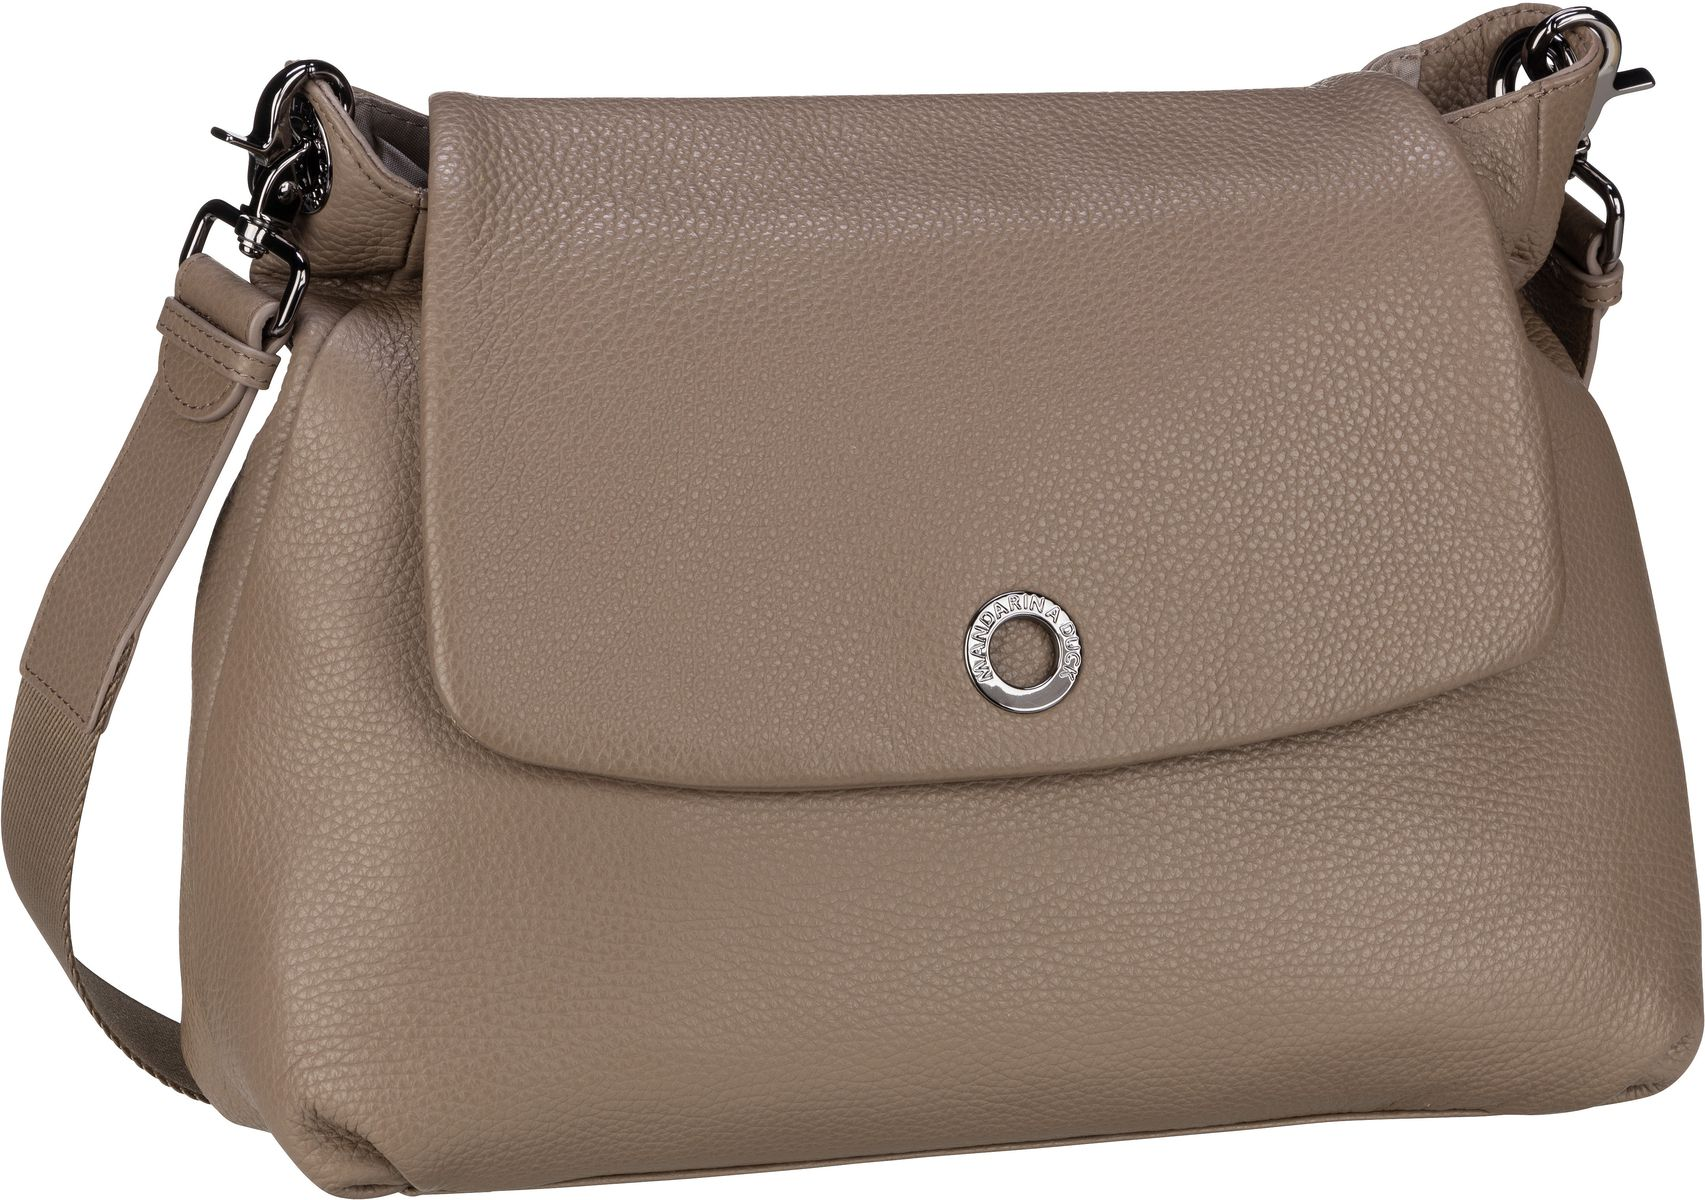 Umhängetasche Mellow Leather Shoulder Bag FZT30 Amphora